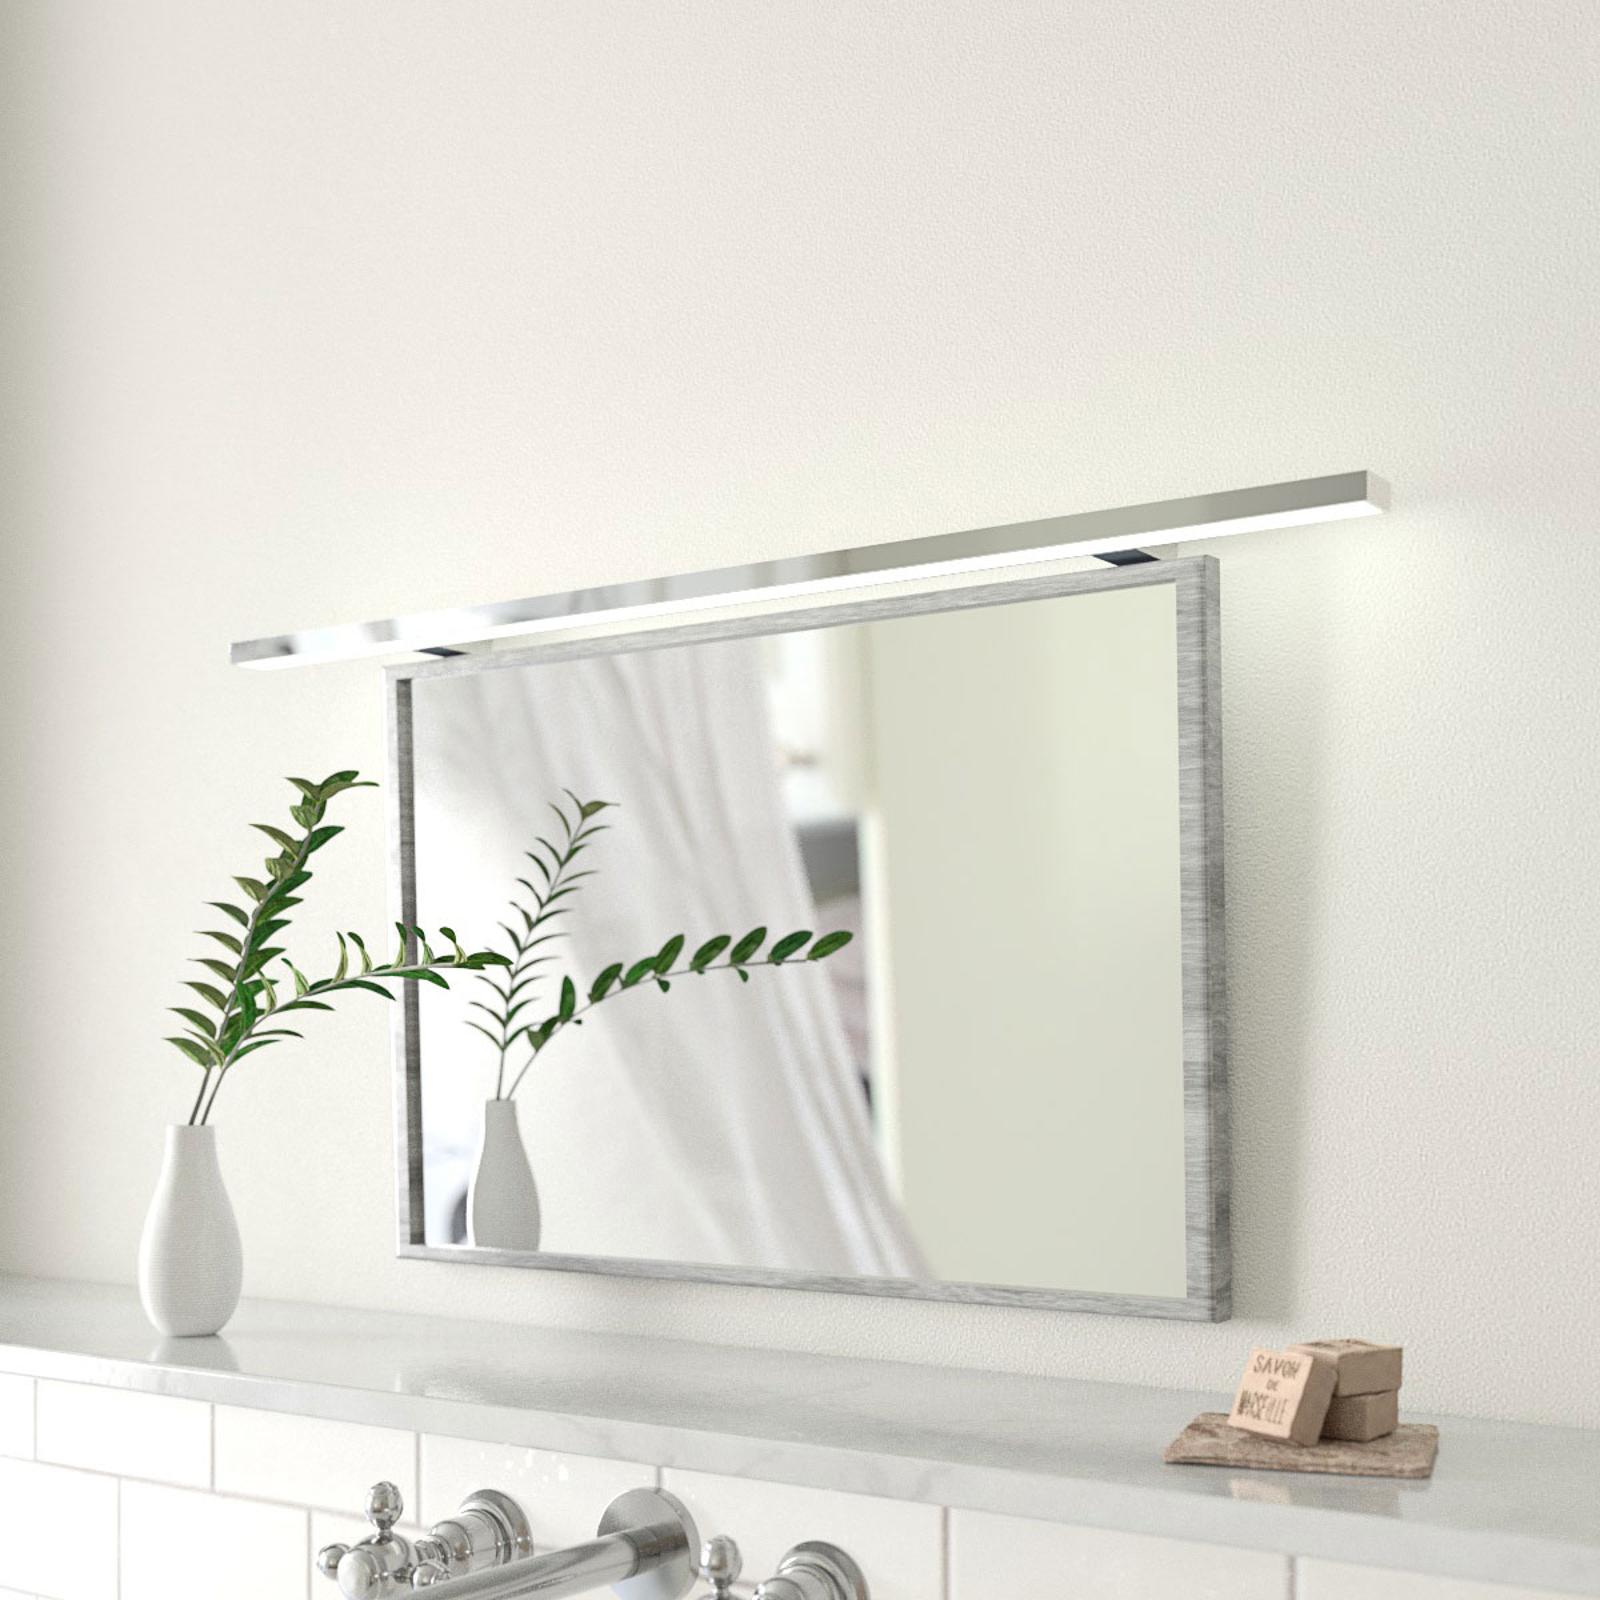 100 cm bred LED-speillampe Esther